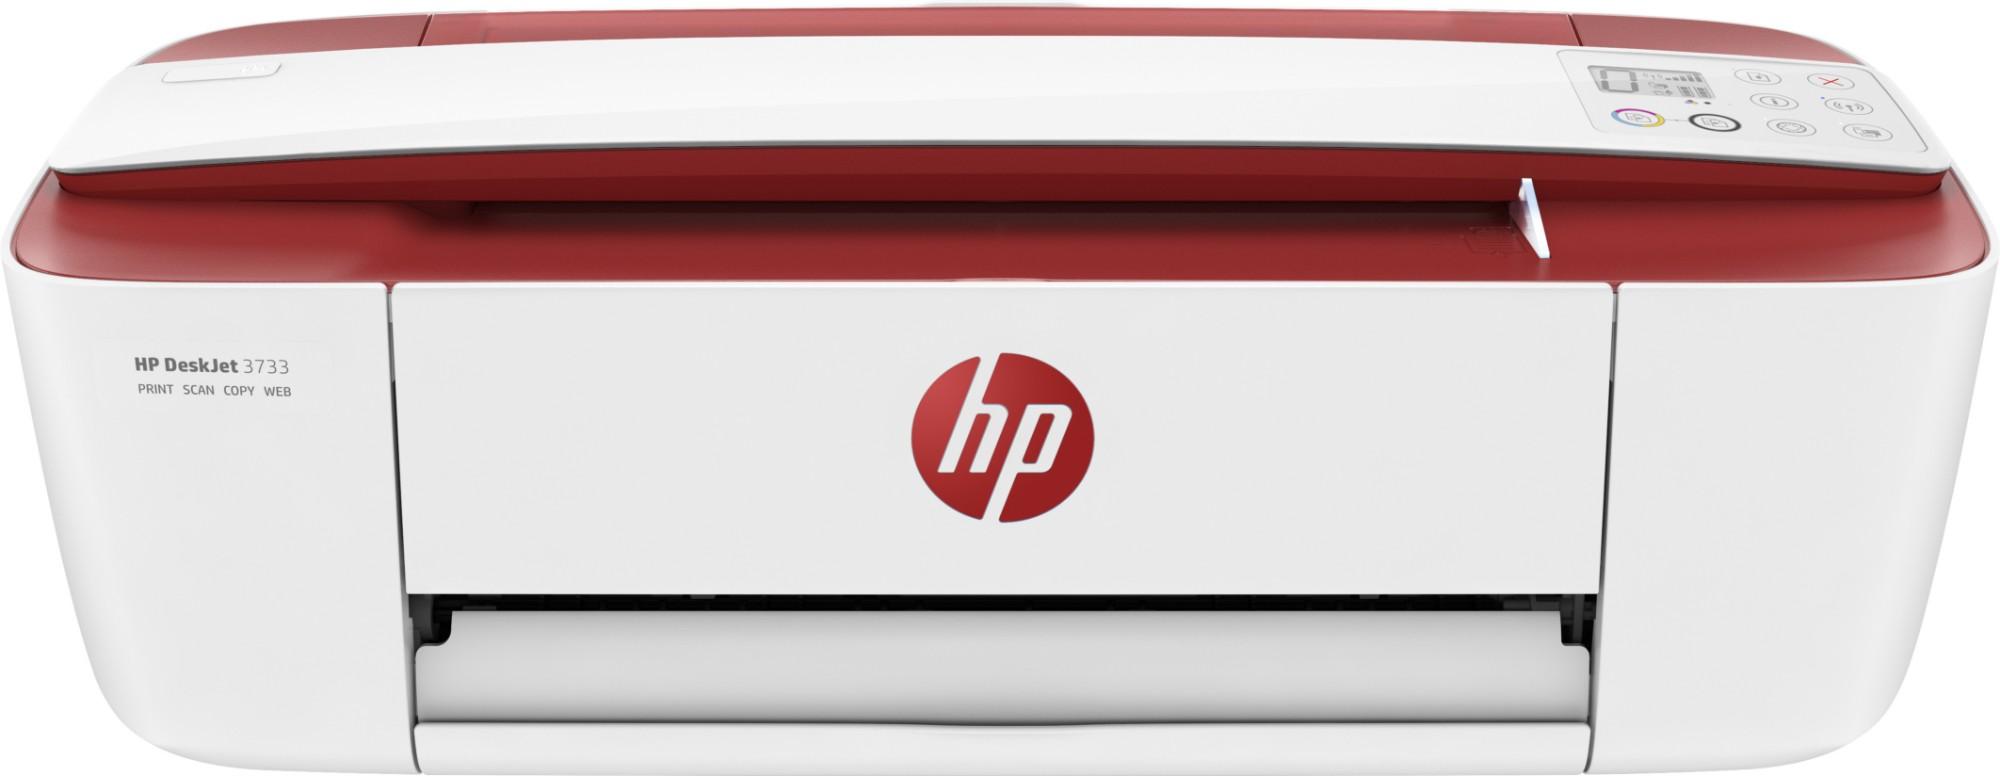 HP DeskJet 3730 All-in-One Printer